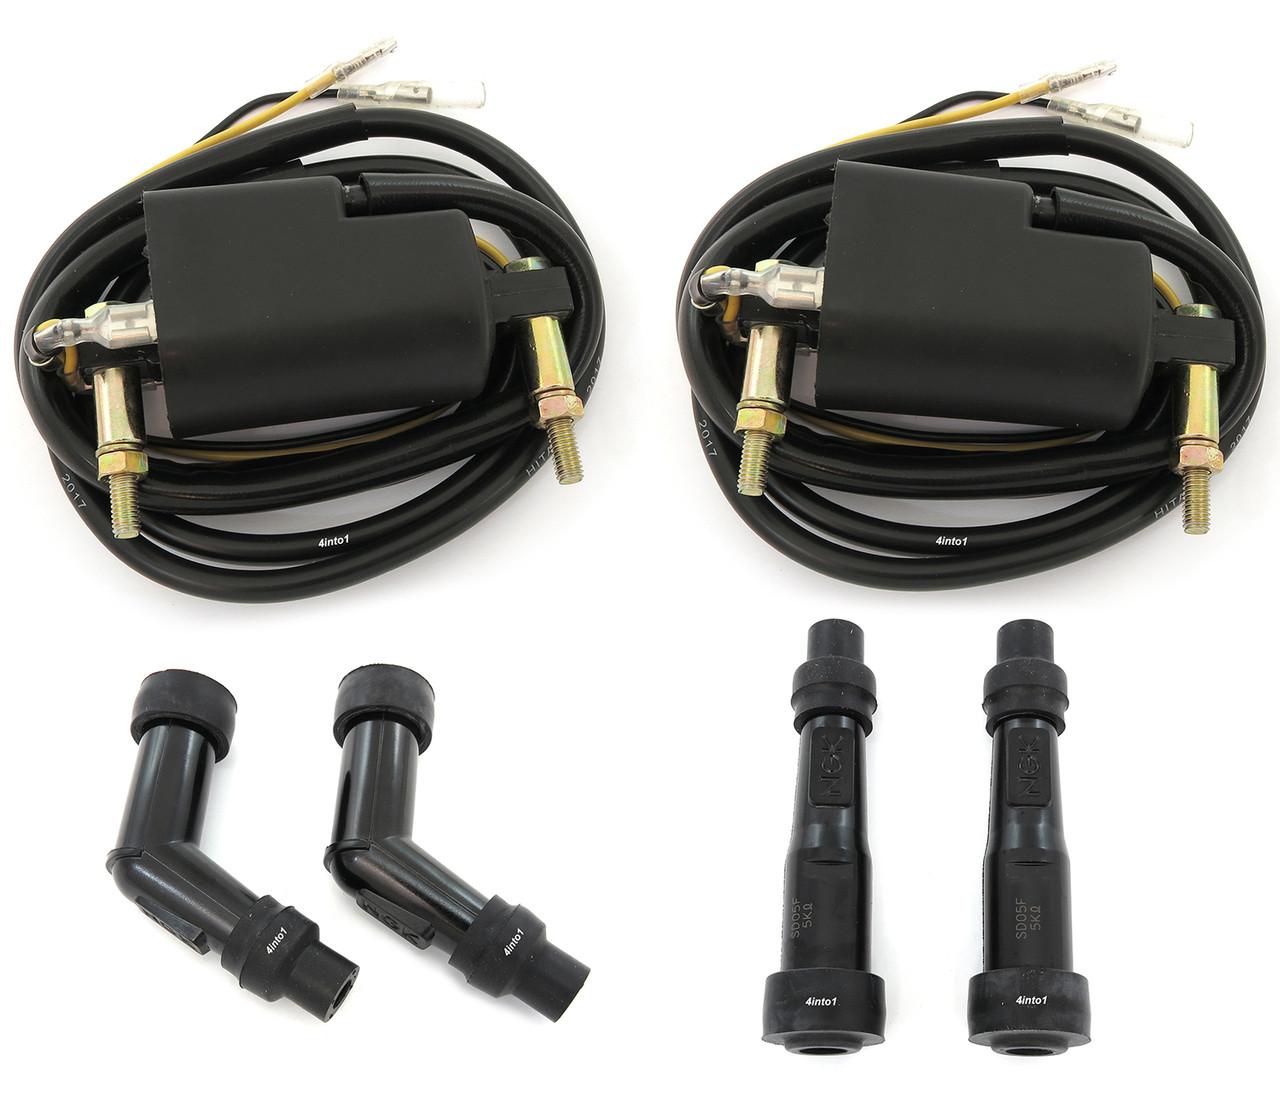 4 ohm Coils and Caps - Kawasaki KZ650/900/1000 - Suzuki GS550/750/850/1000